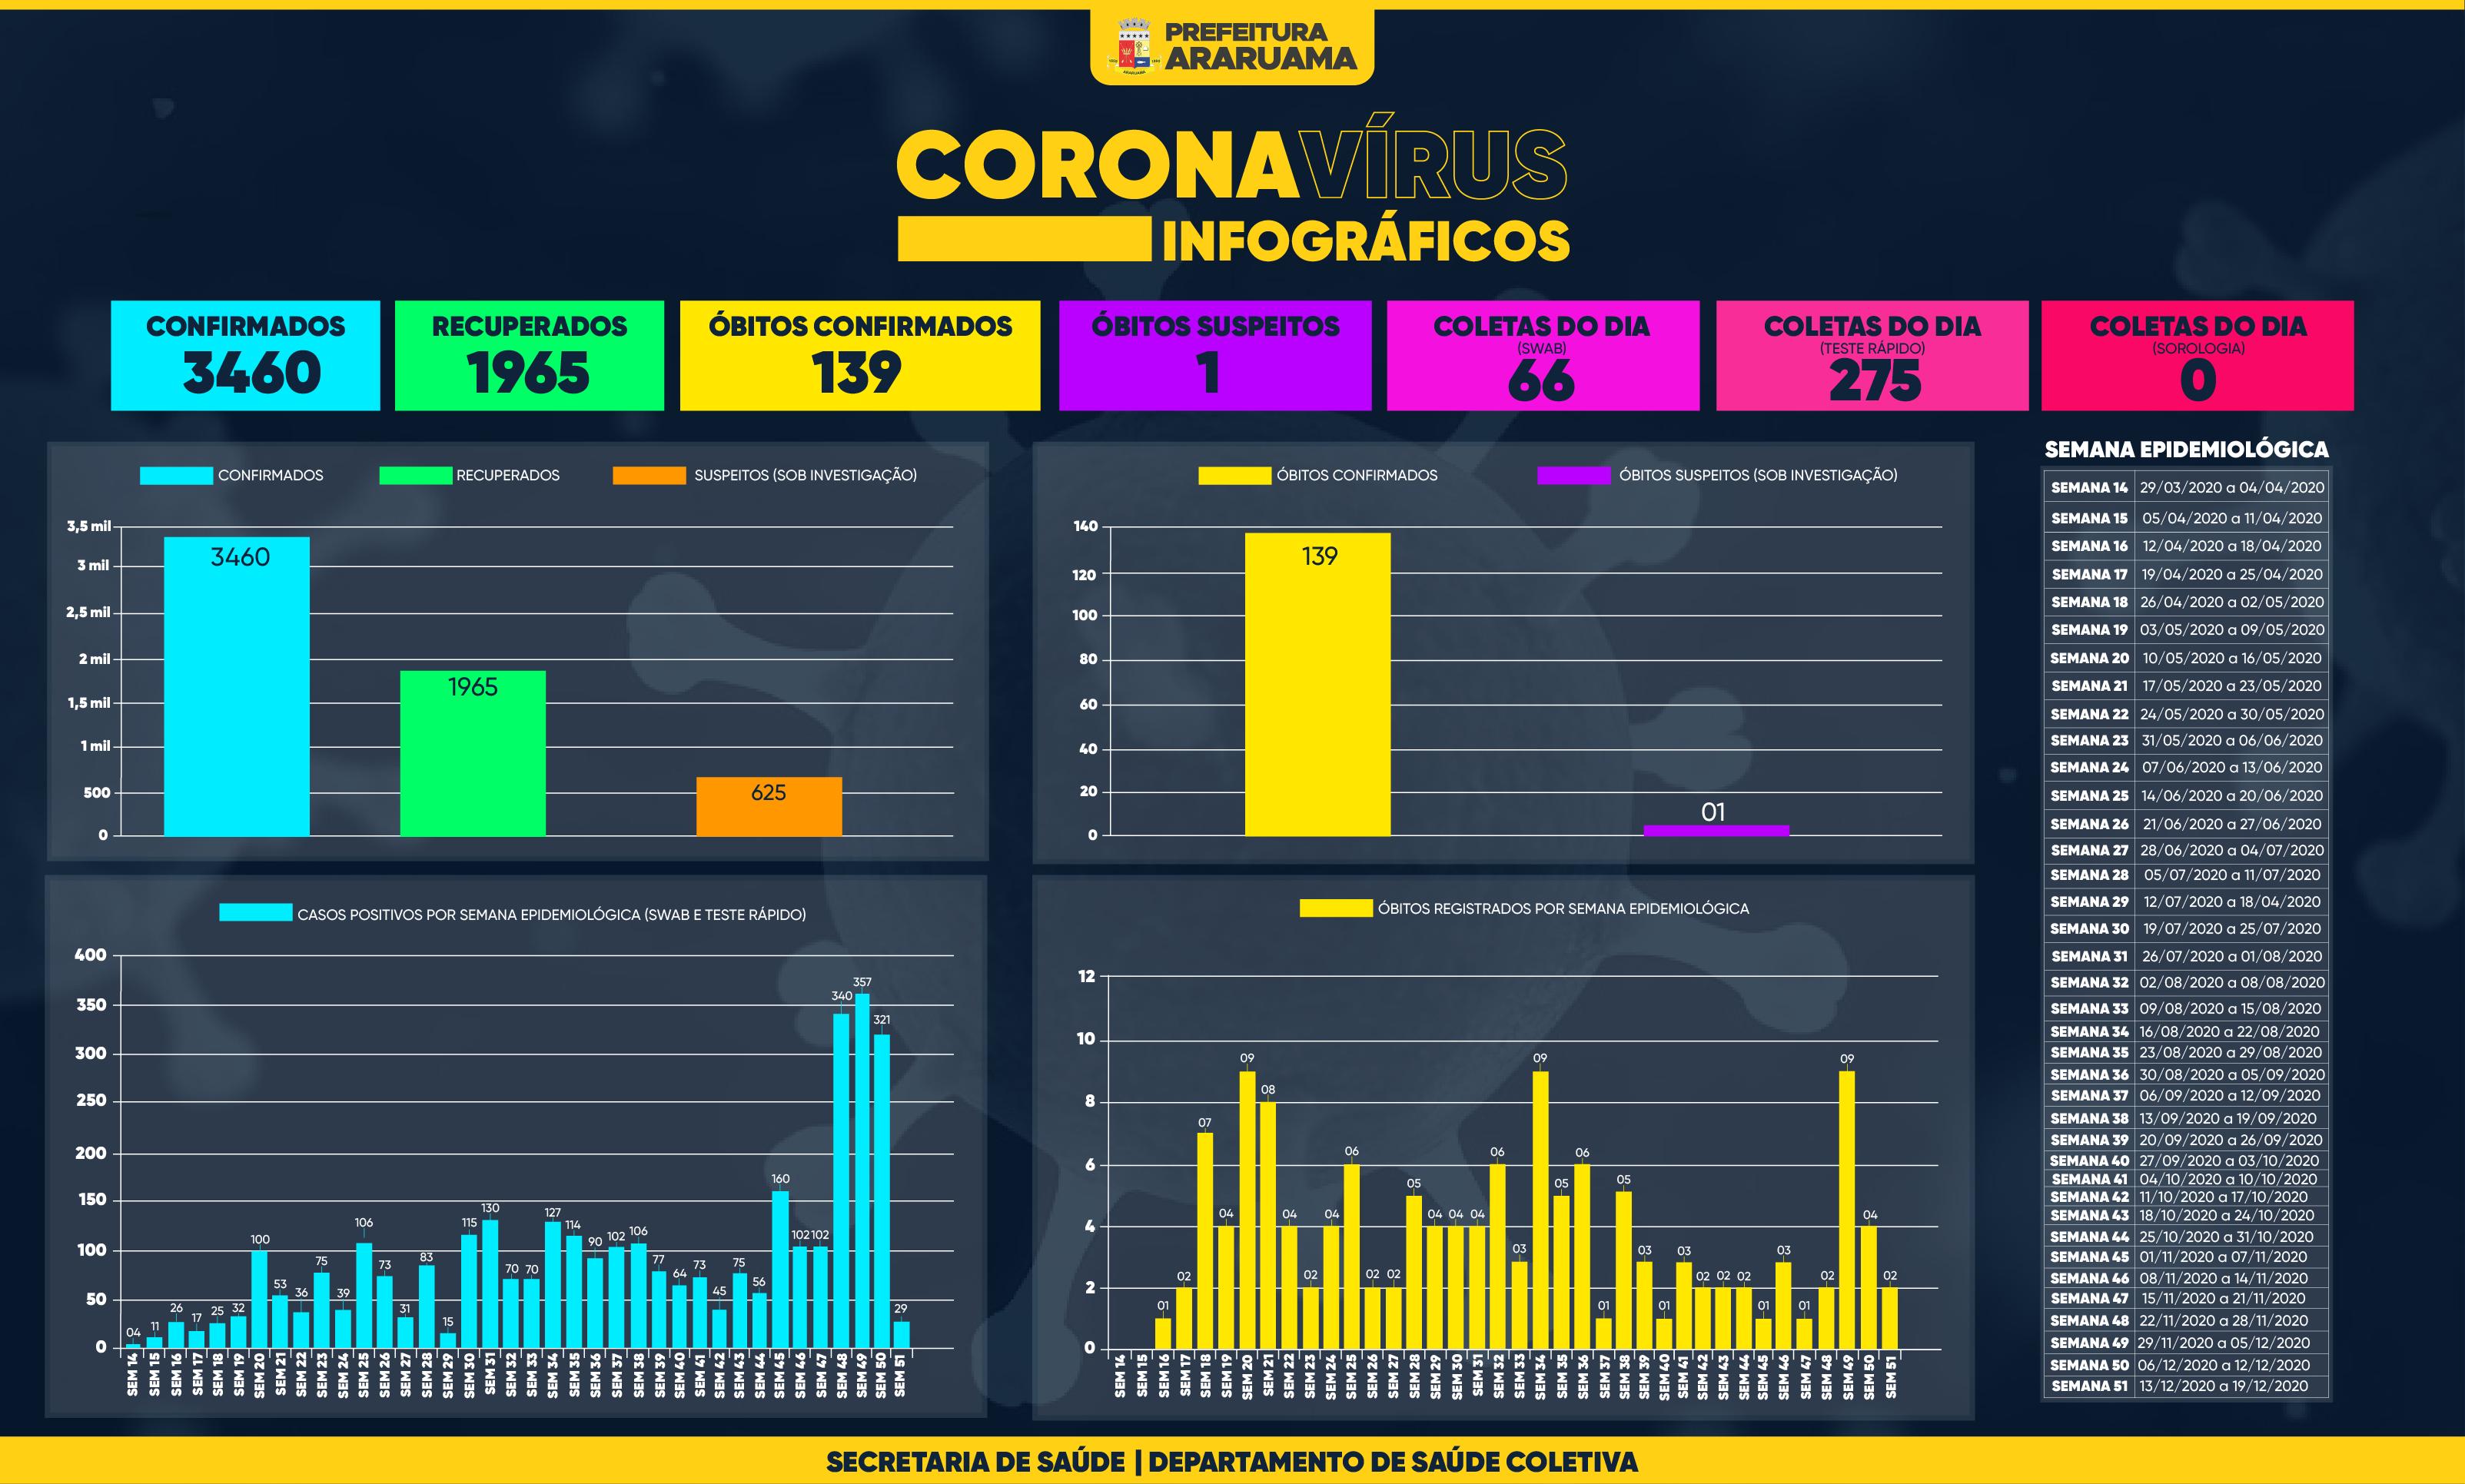 Painel de Monitoramento COVID-19 — Semana 51 — 17 de dezembro de 2020